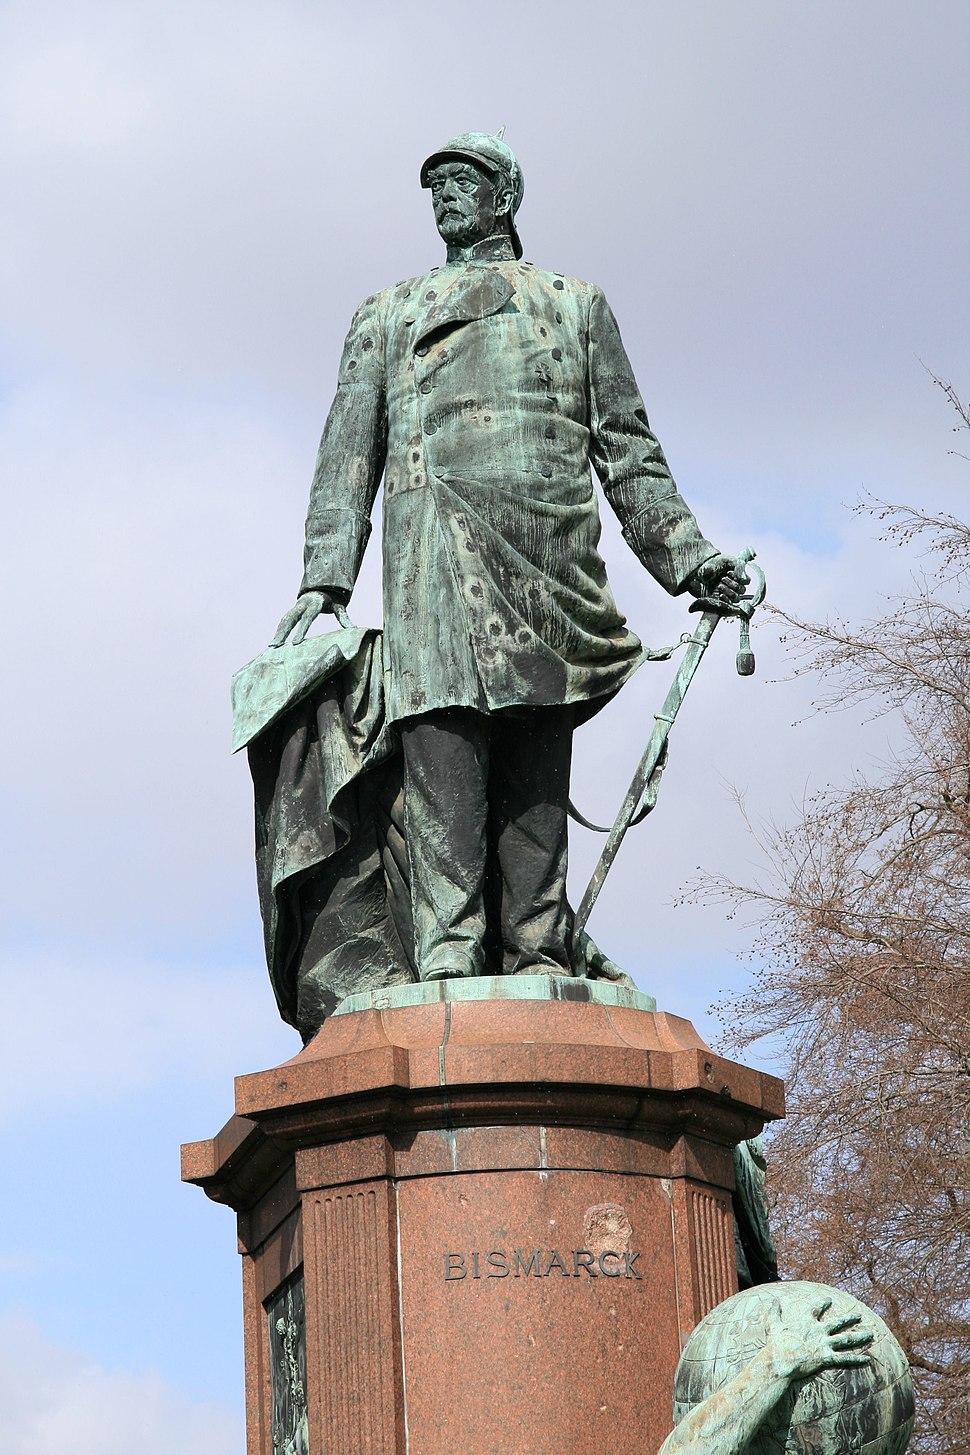 Bismarck-Nationaldenkmal, März 2008